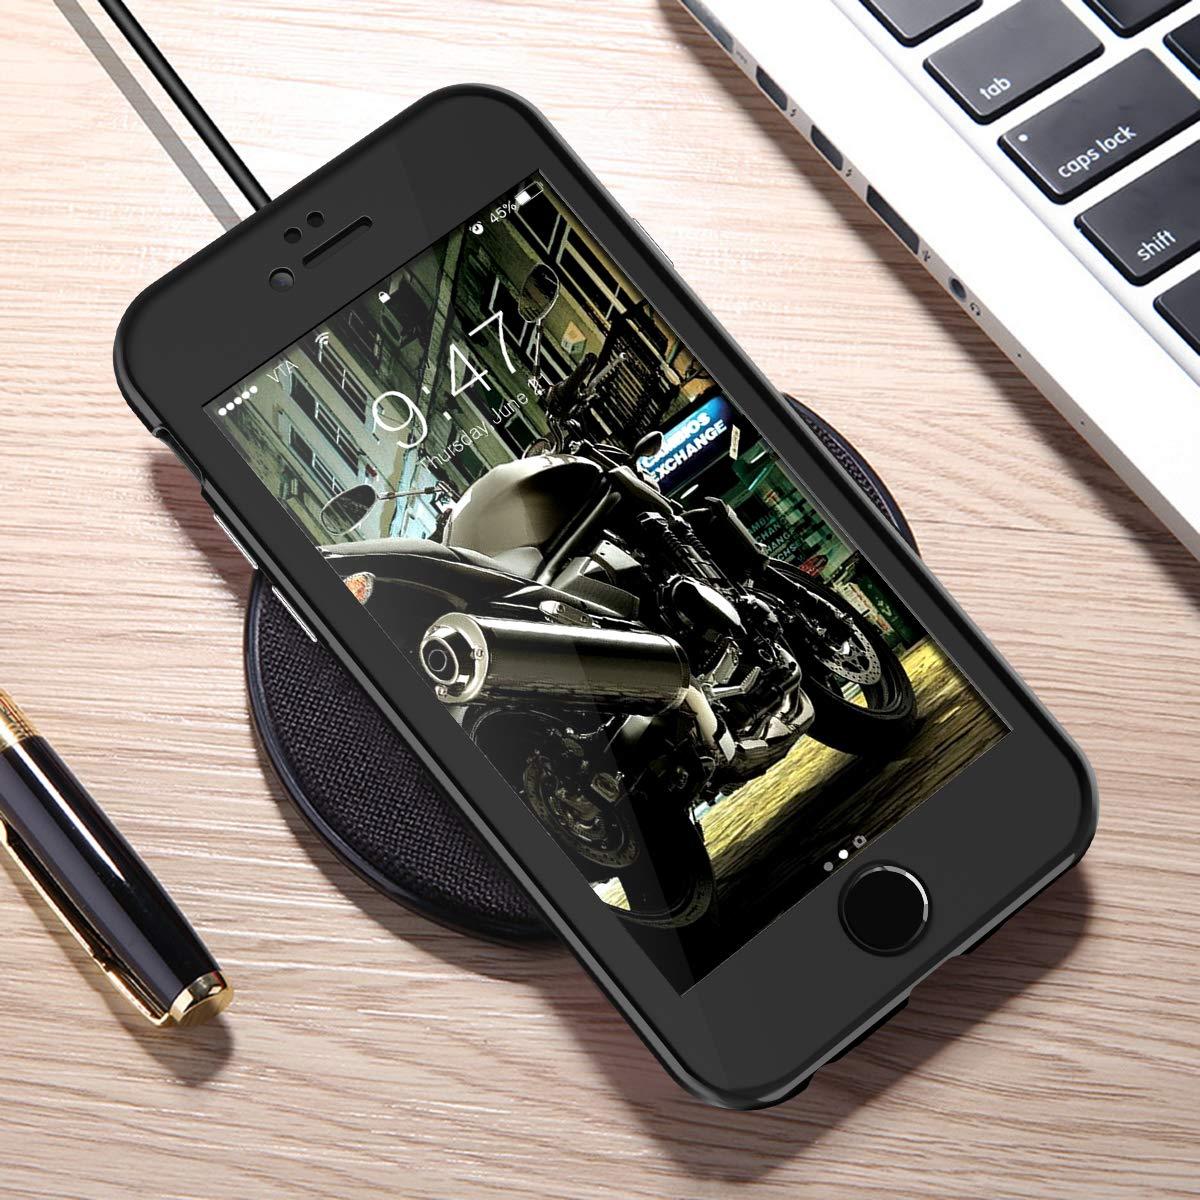 Hardcase 2 in 1 Handyh/ülle 360 Magnetisch Hard Full Body Macaron Schutzh/ülle Bumper Schwarz CE-Link iPhone 6 Plus H/ülle iPhone 6s Plus H/ülle with iPhone 6 Plus//iPhone 6s Plus Panzerglas